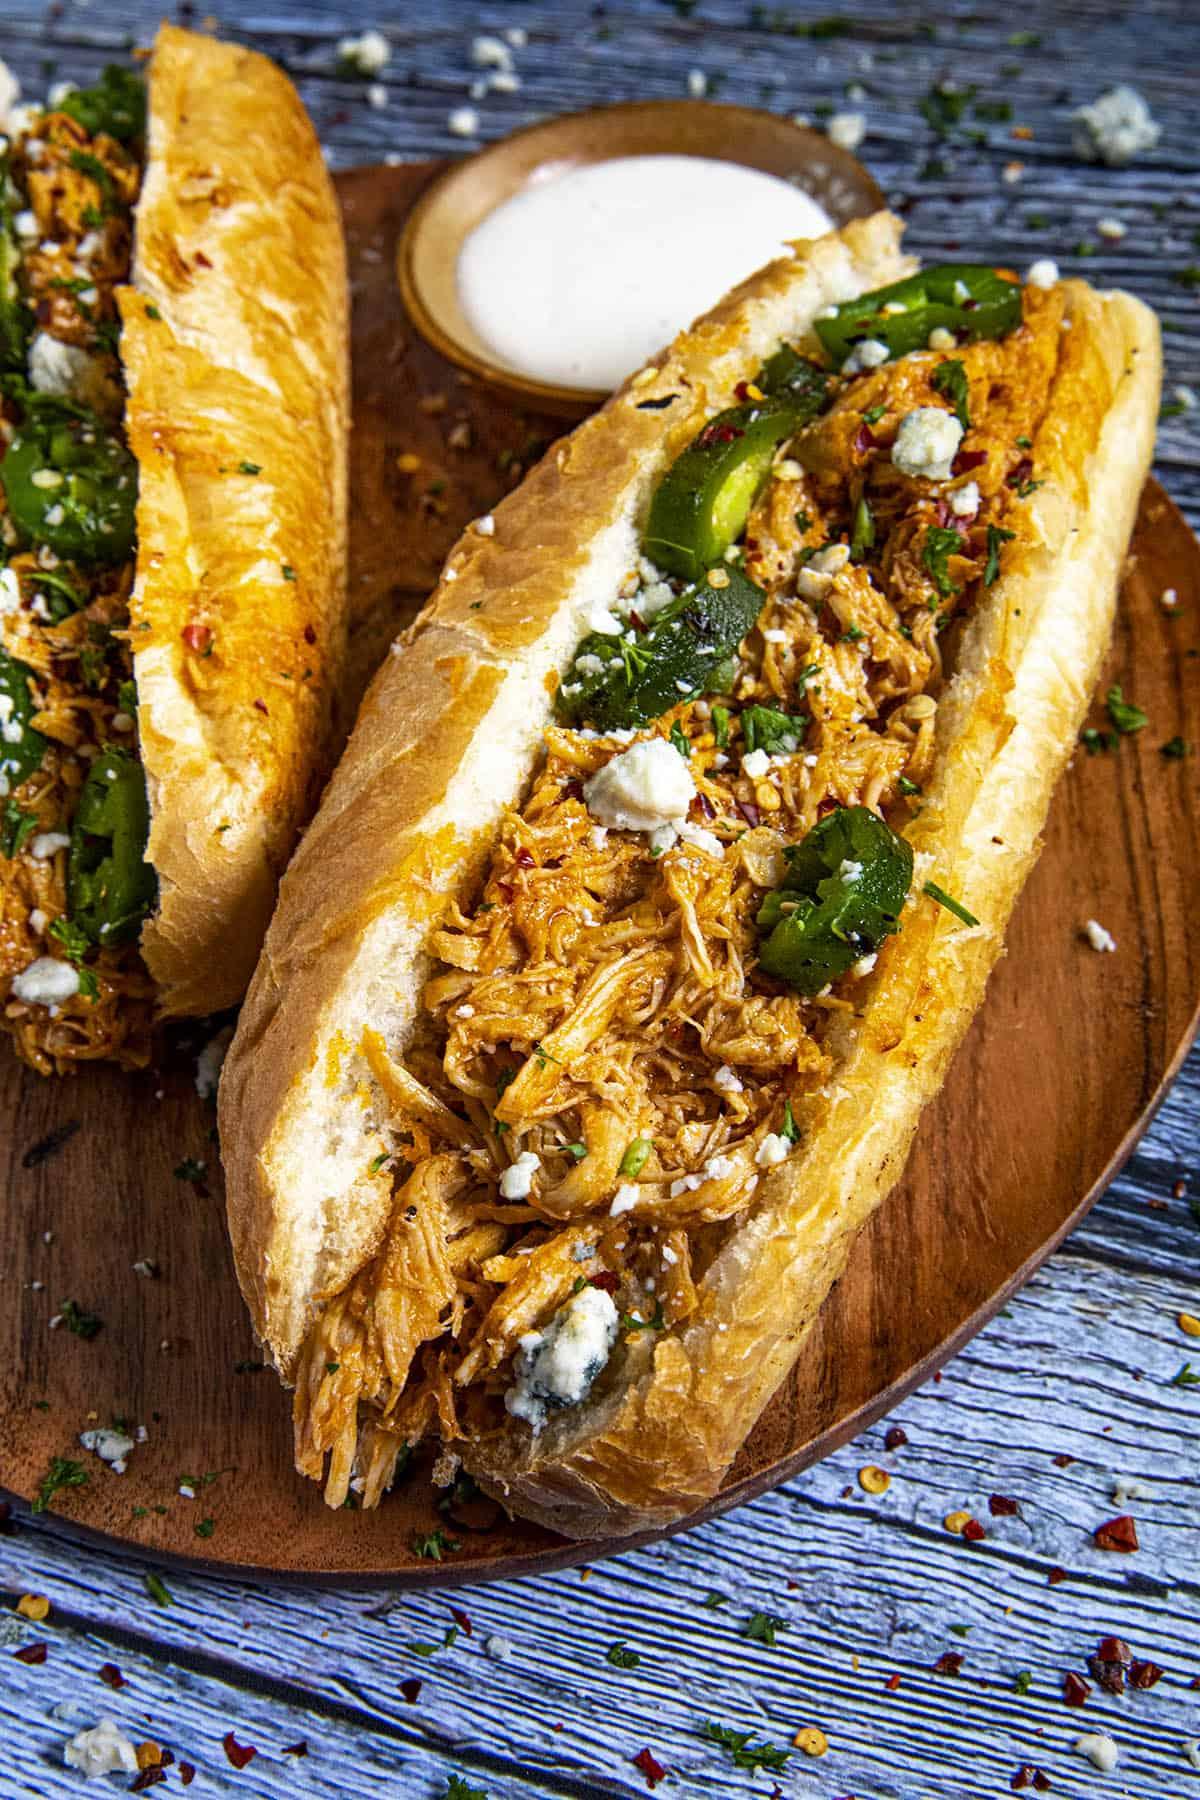 Buffalo Chicken Sandwiches, ready to serve